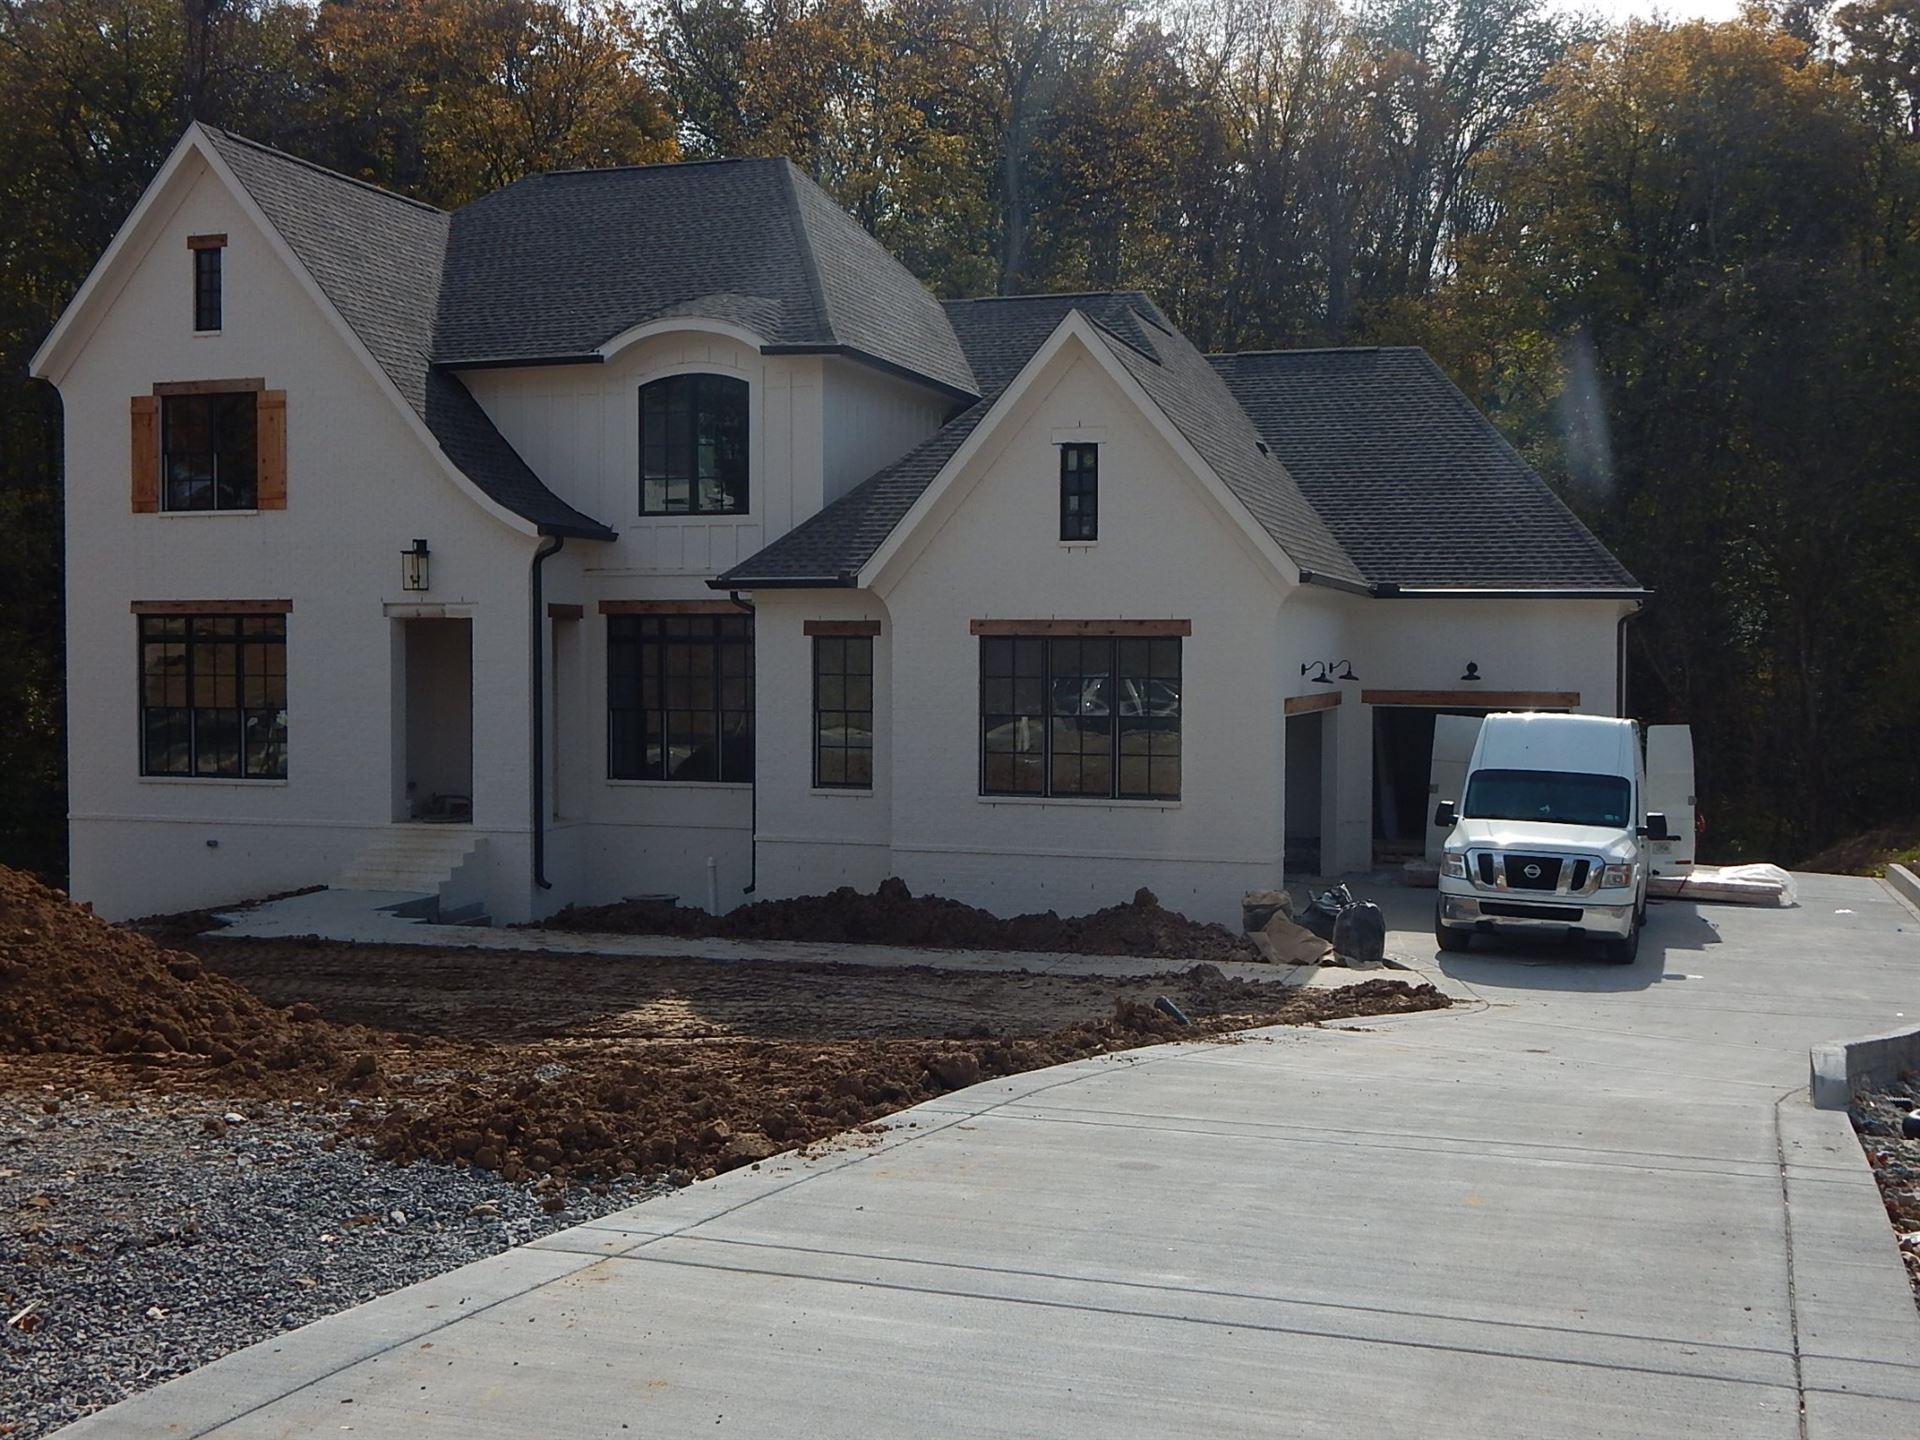 Photo of 1593 Eastwood Drive, L 123, Brentwood, TN 37027 (MLS # 2105104)